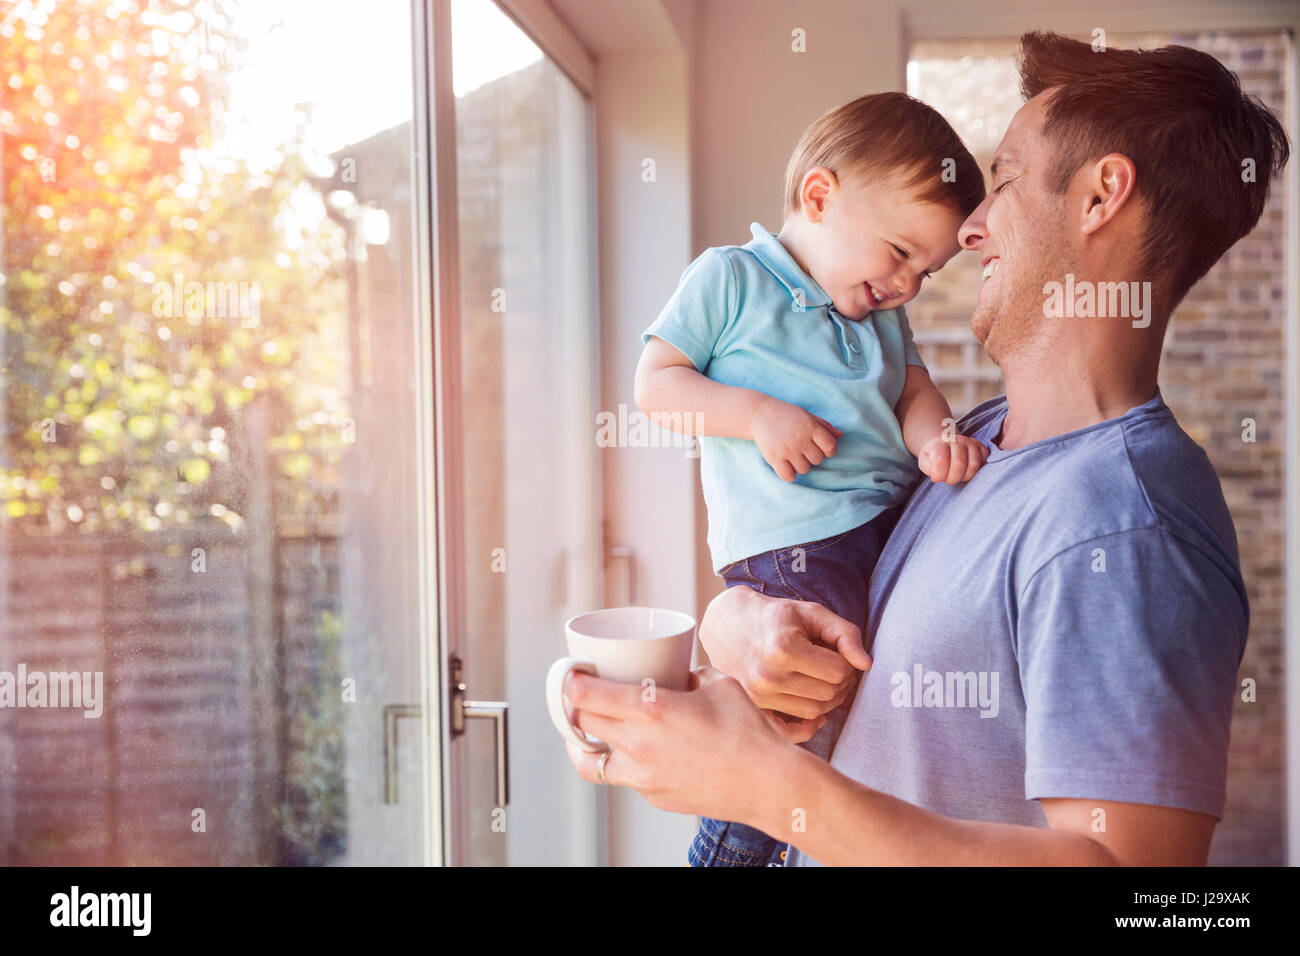 Vater hält kleinen Sohn beim Kaffeetrinken zu Hause am Fenster Stockbild